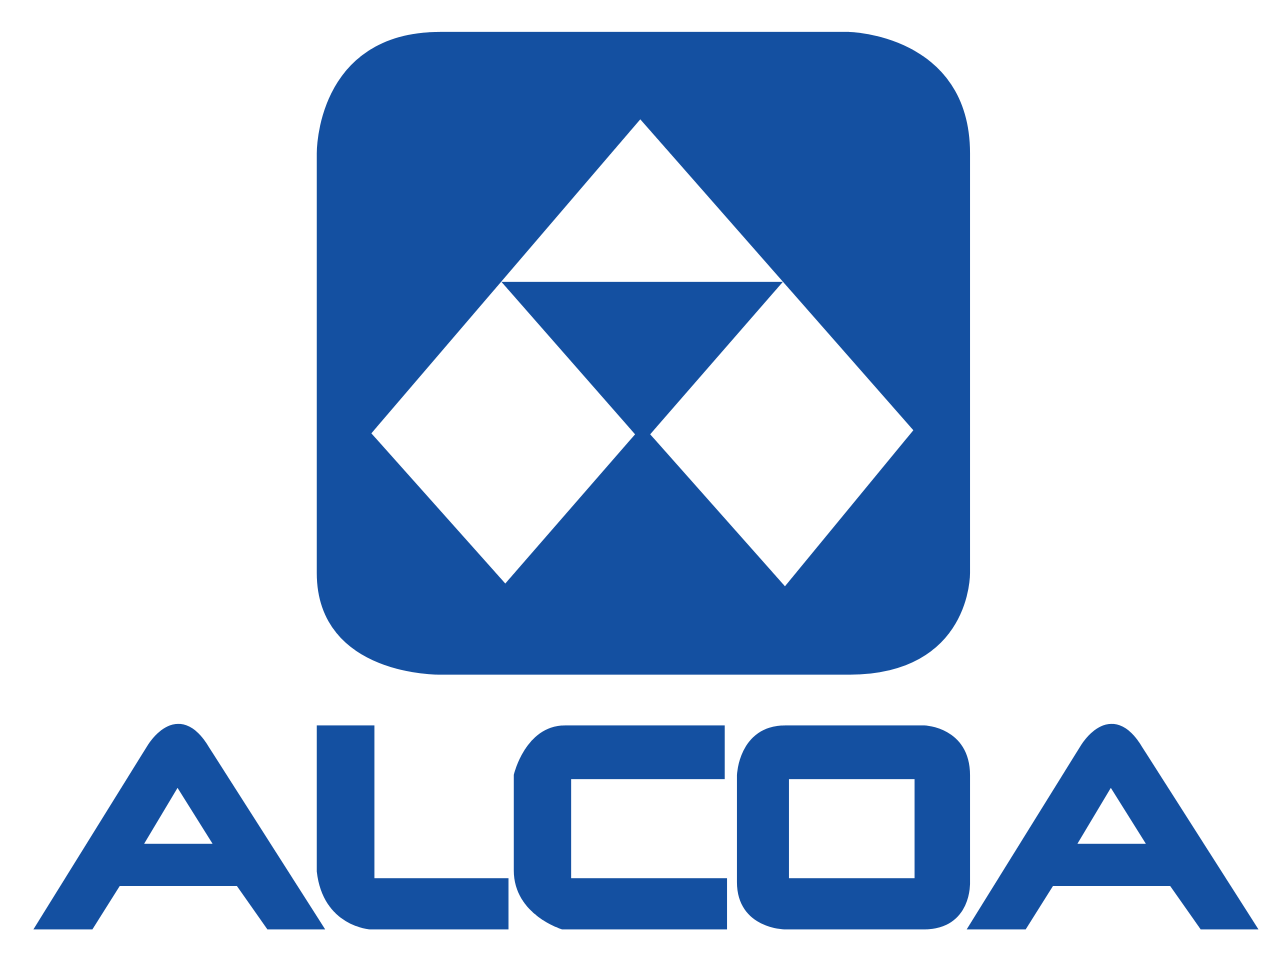 Logo_ALCOA.svg